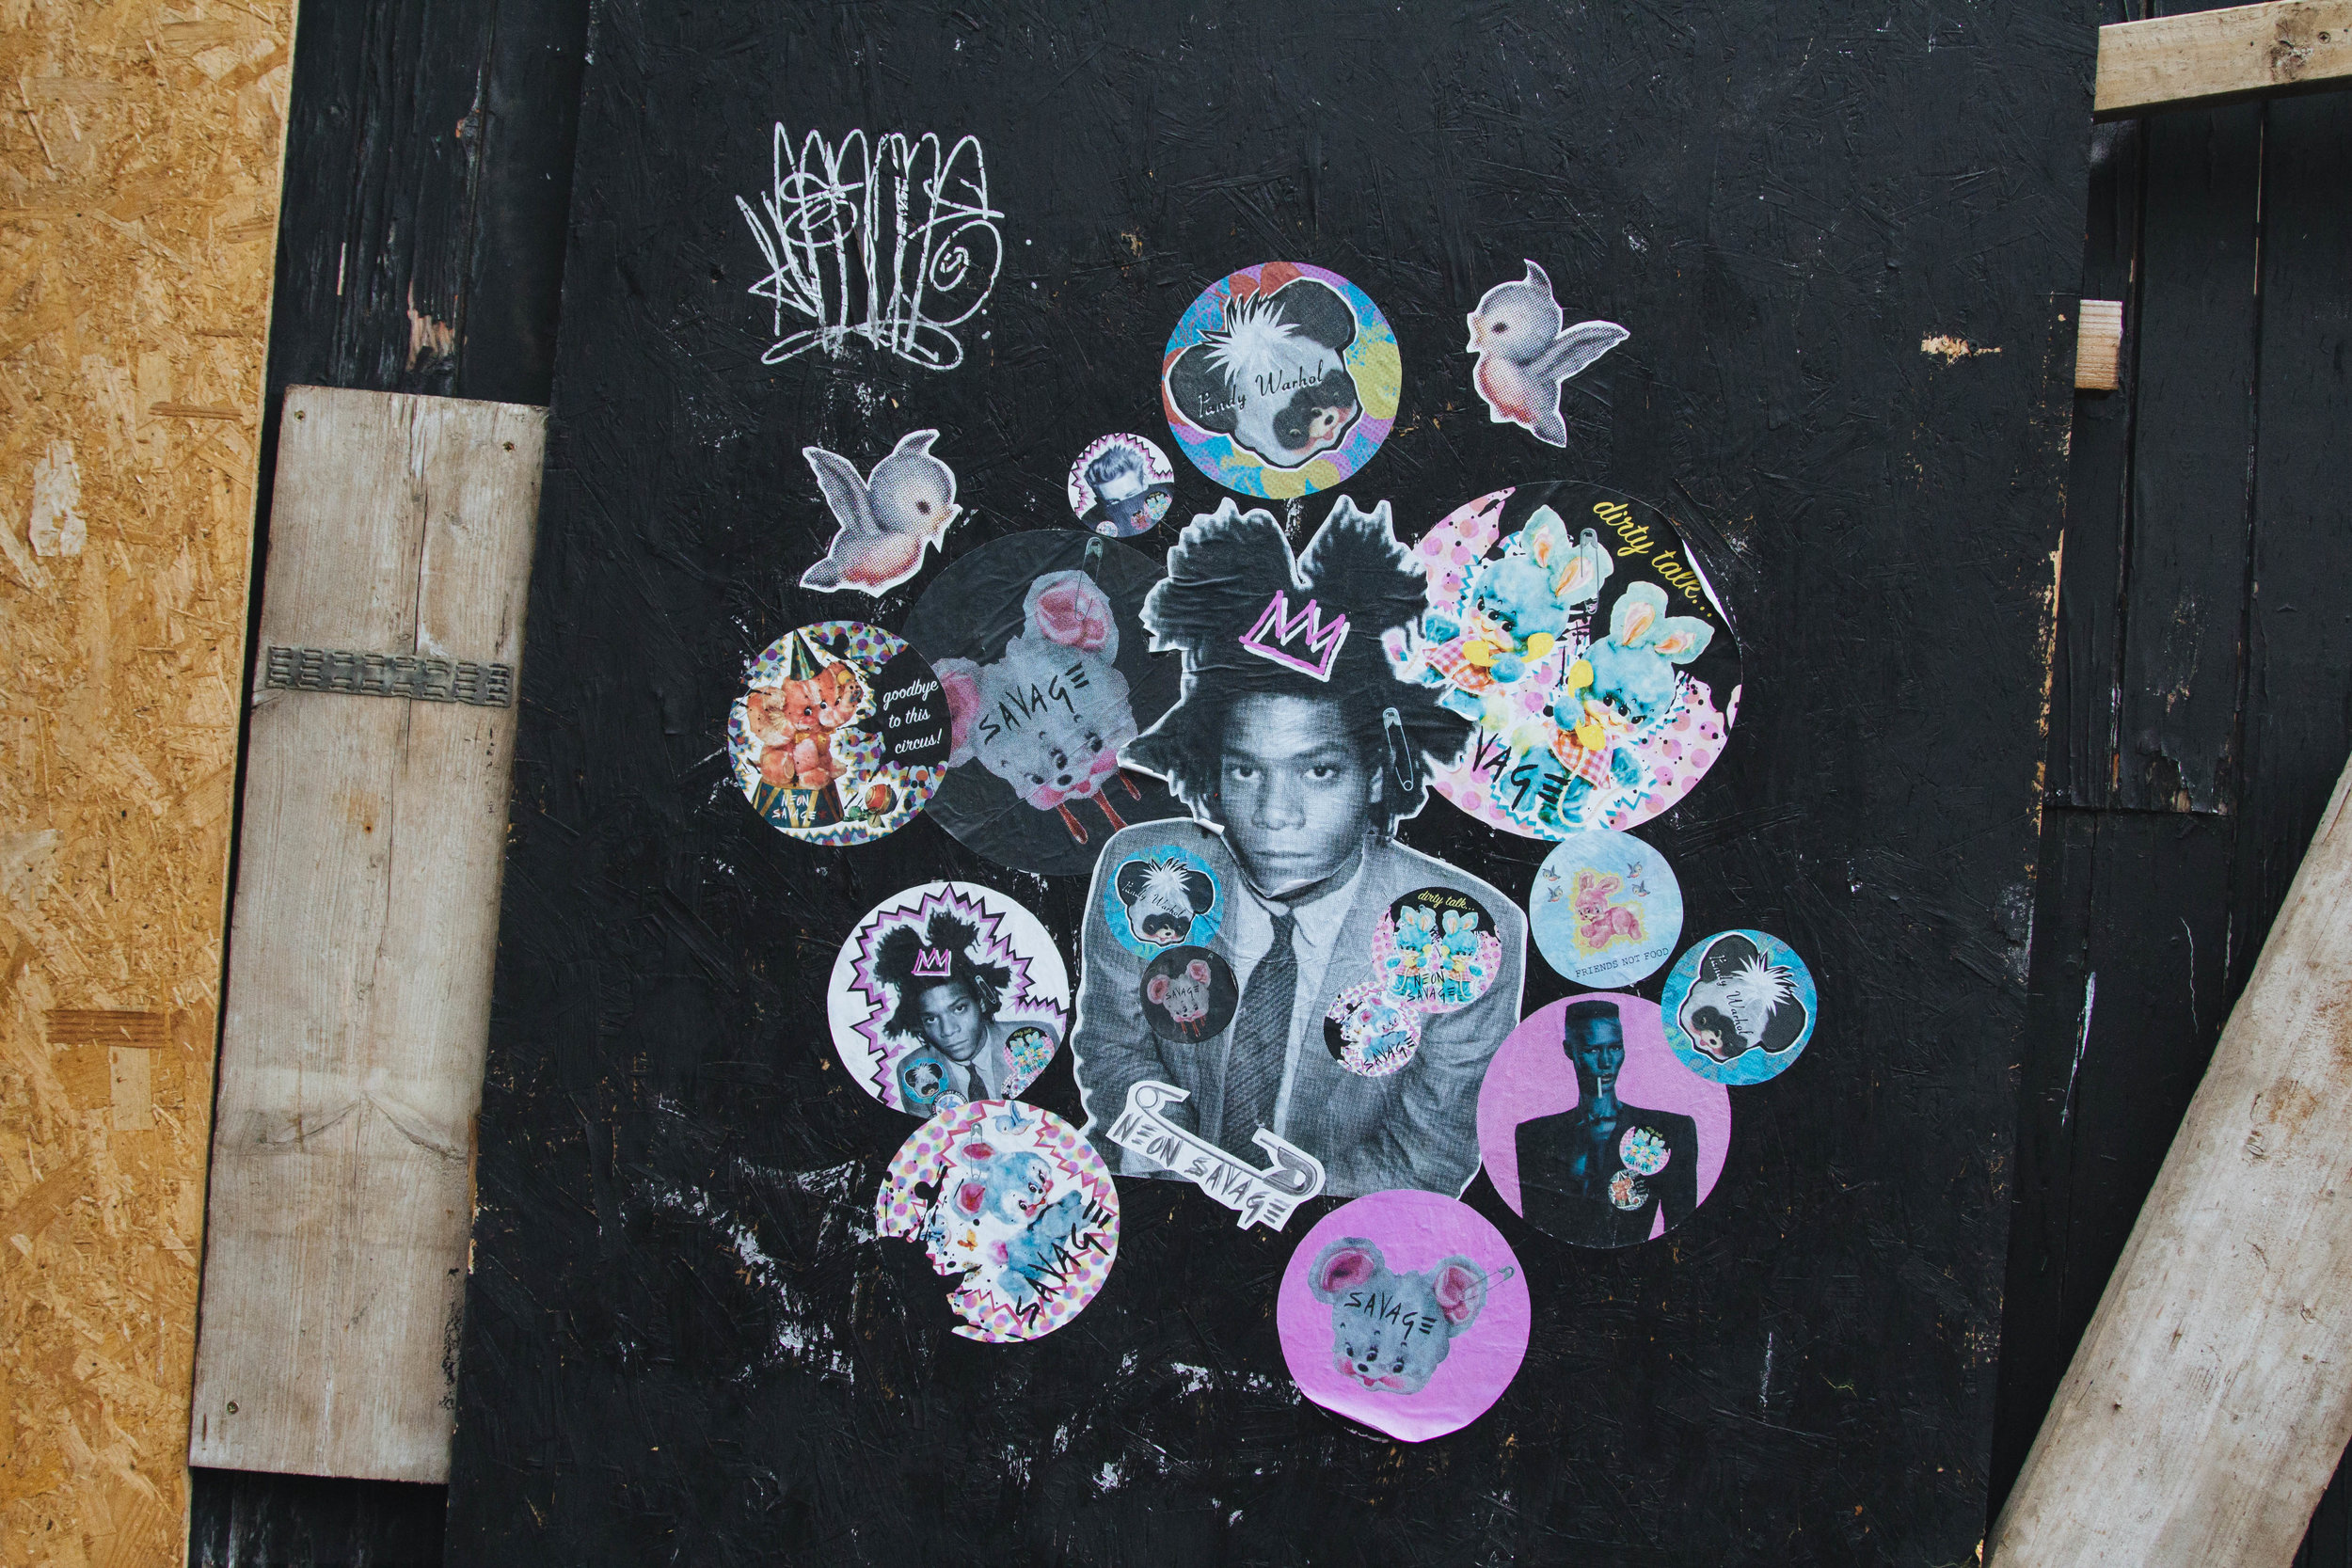 Homage to Jean-Michel Basquiat